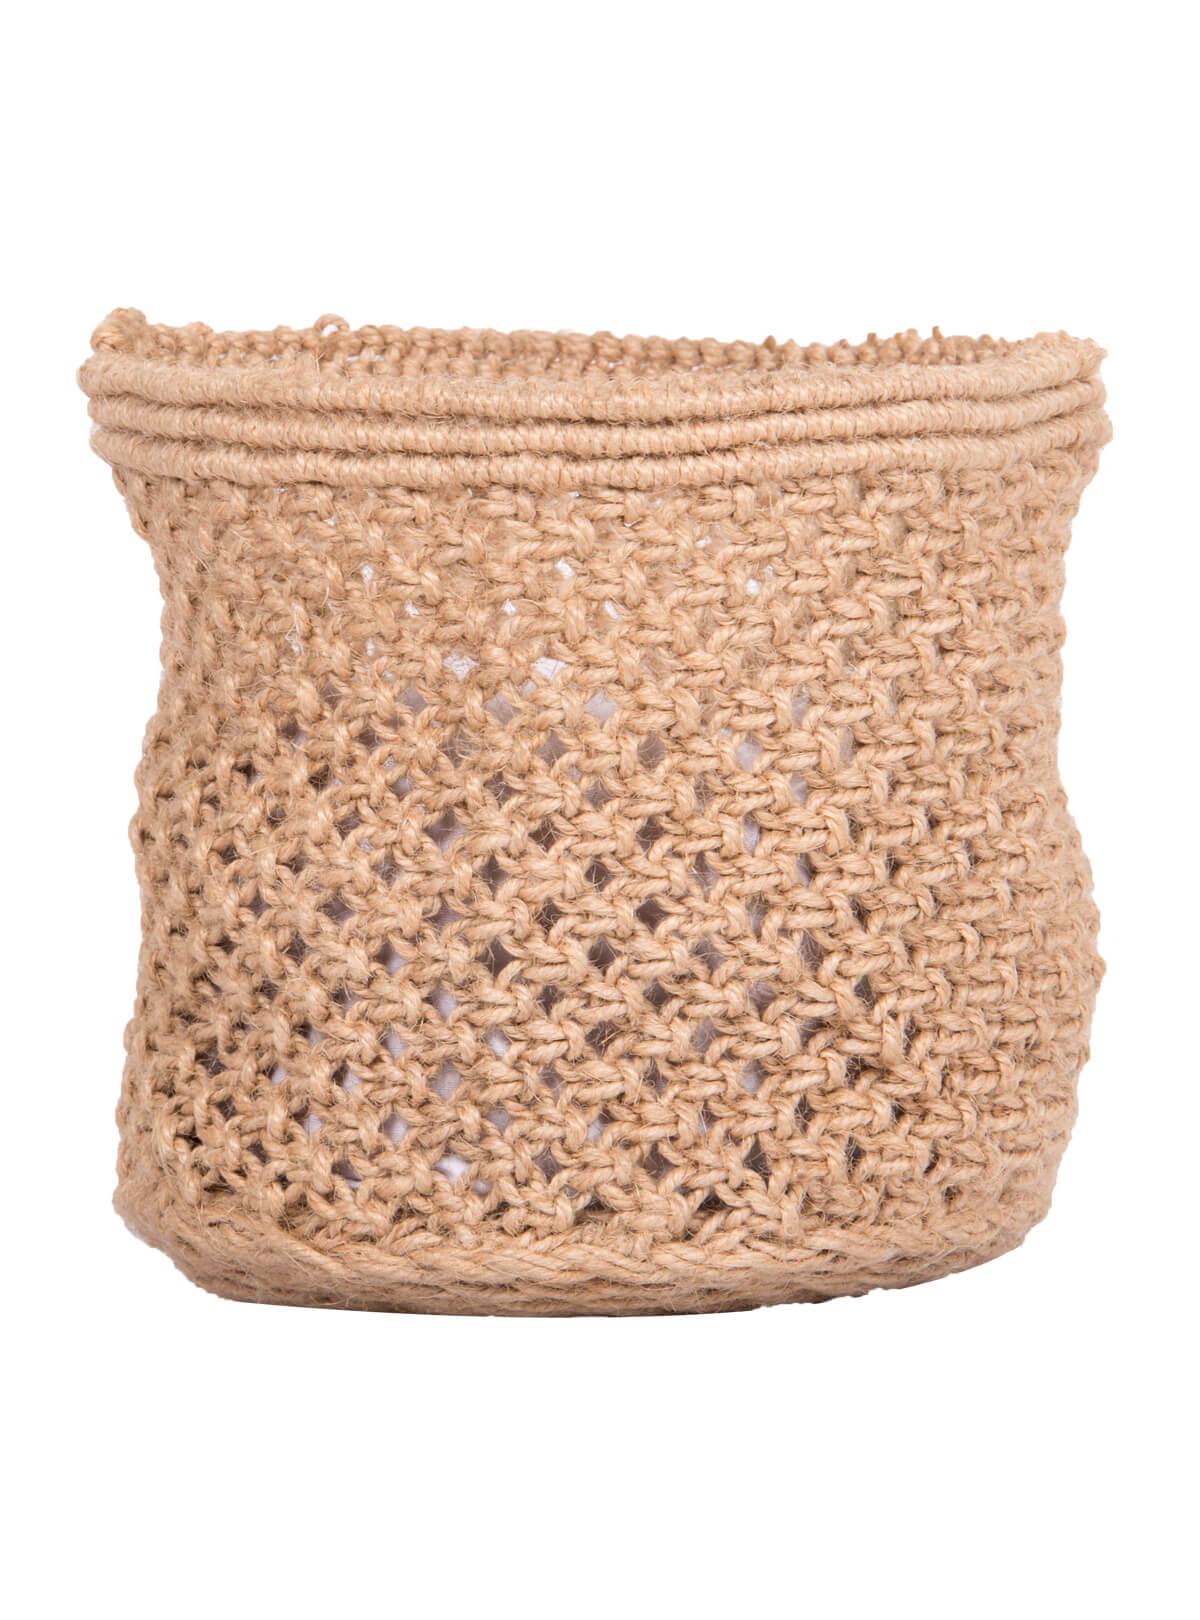 Spanish White Jute Small Basket